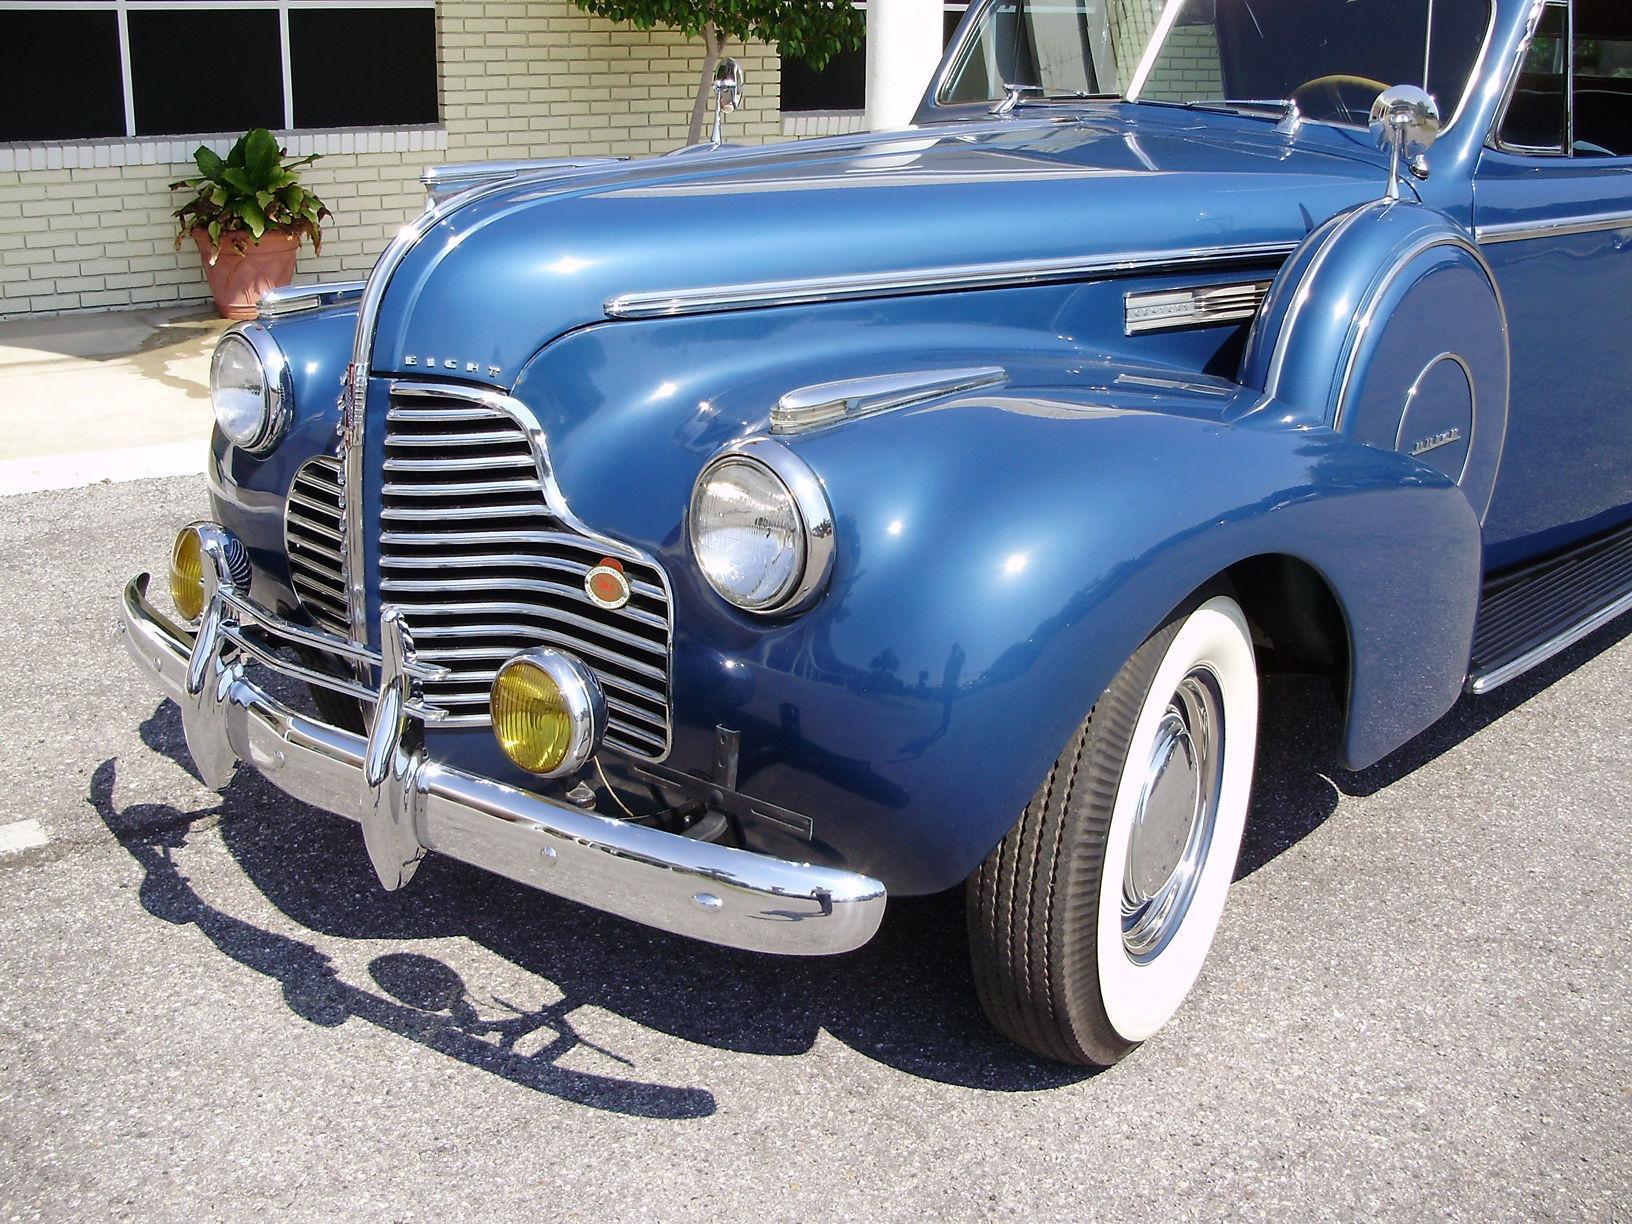 1940 BUICK CENTURY CONVERTIBLE SEDAN - Vintage Motors of Sarasota Inc. #19